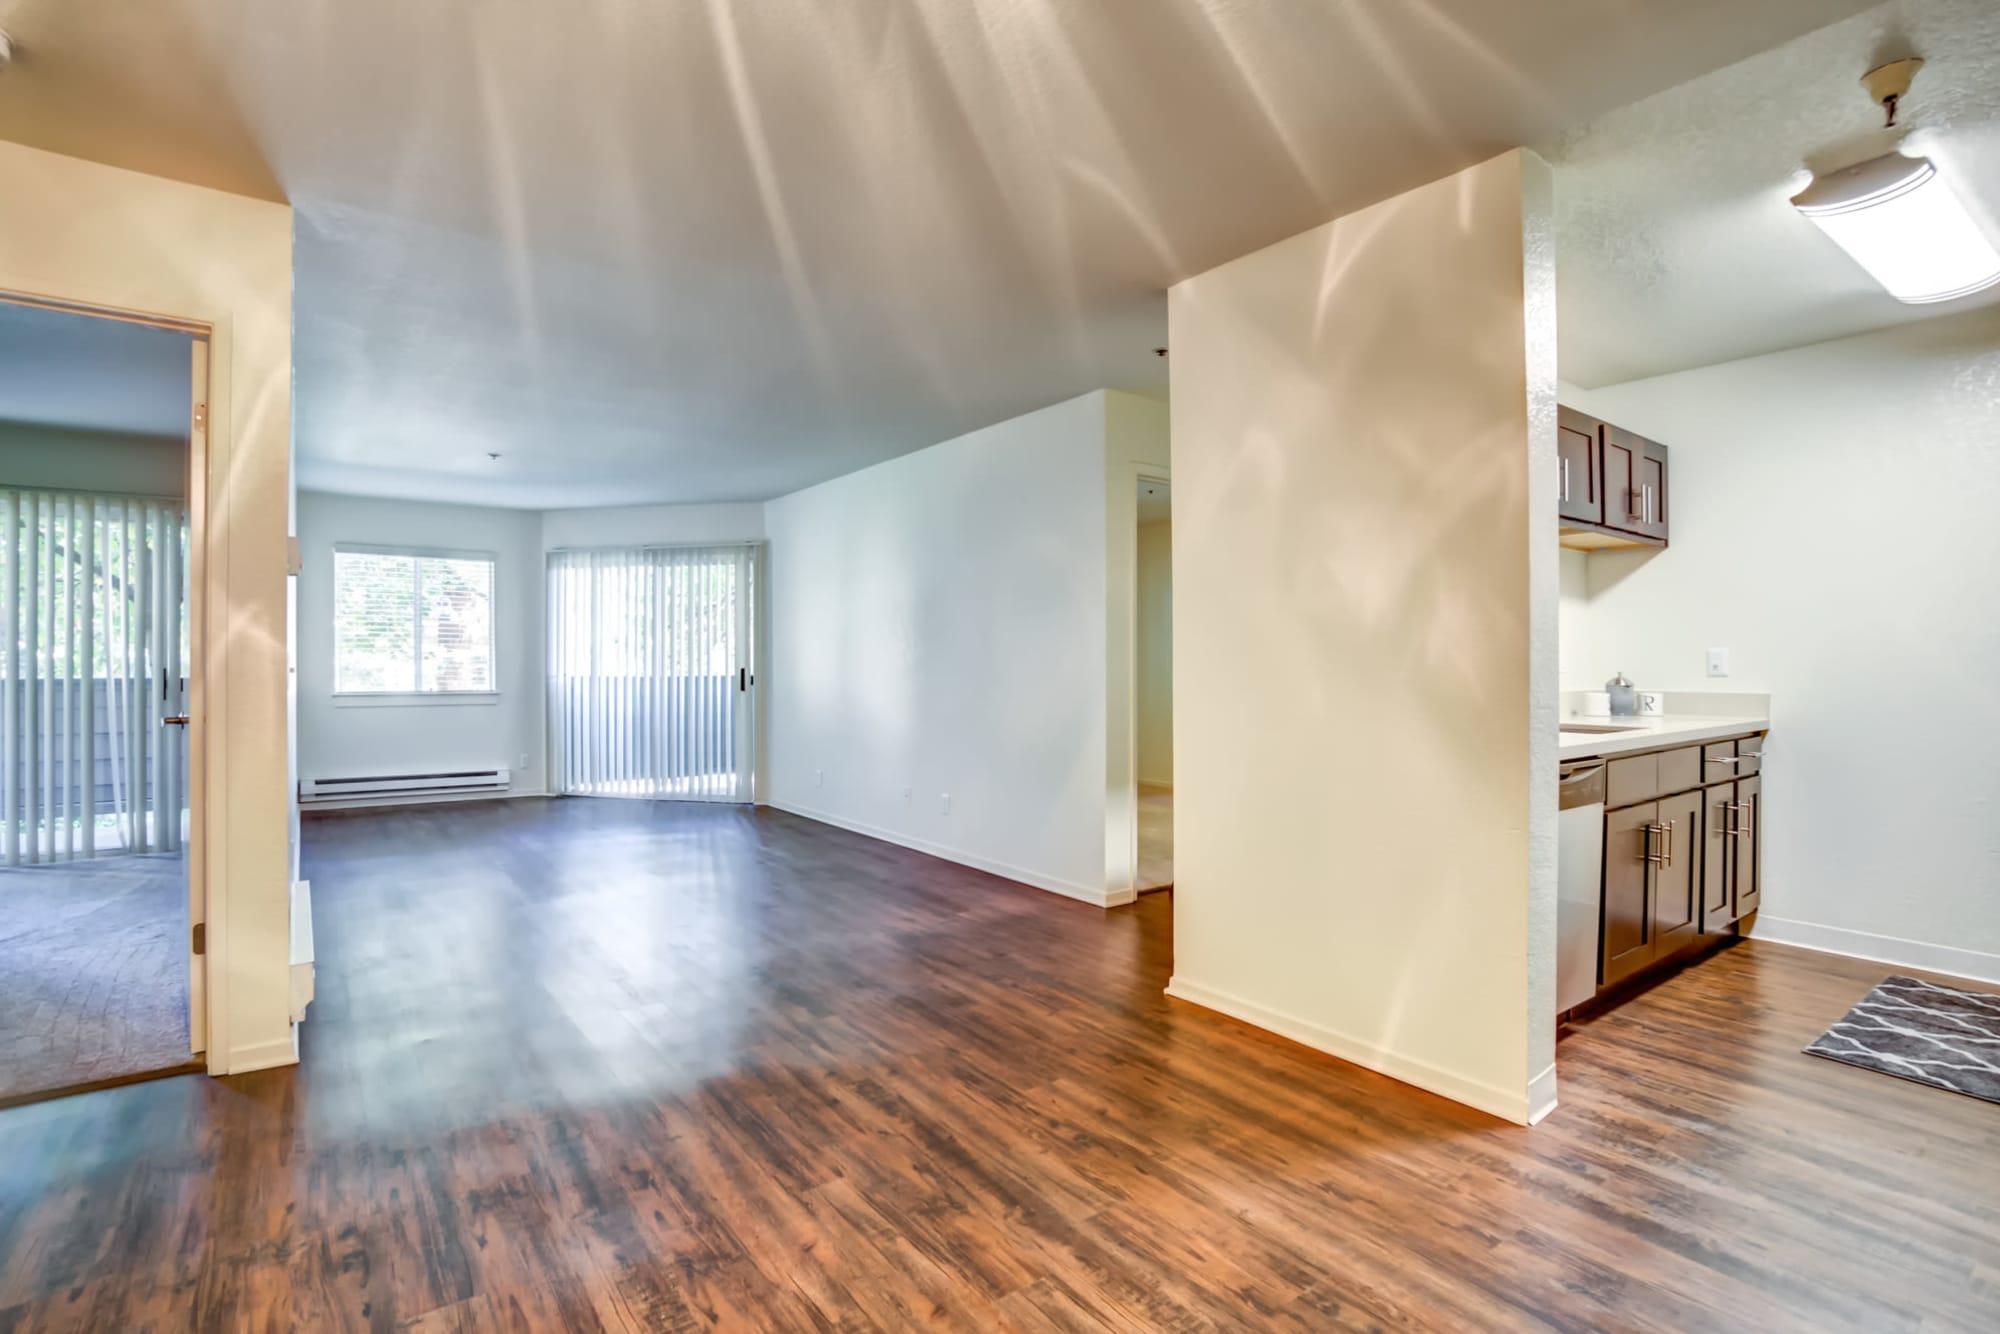 Open Floor Plan Layout Living Room at Serramonte Ridge Apartment Homes